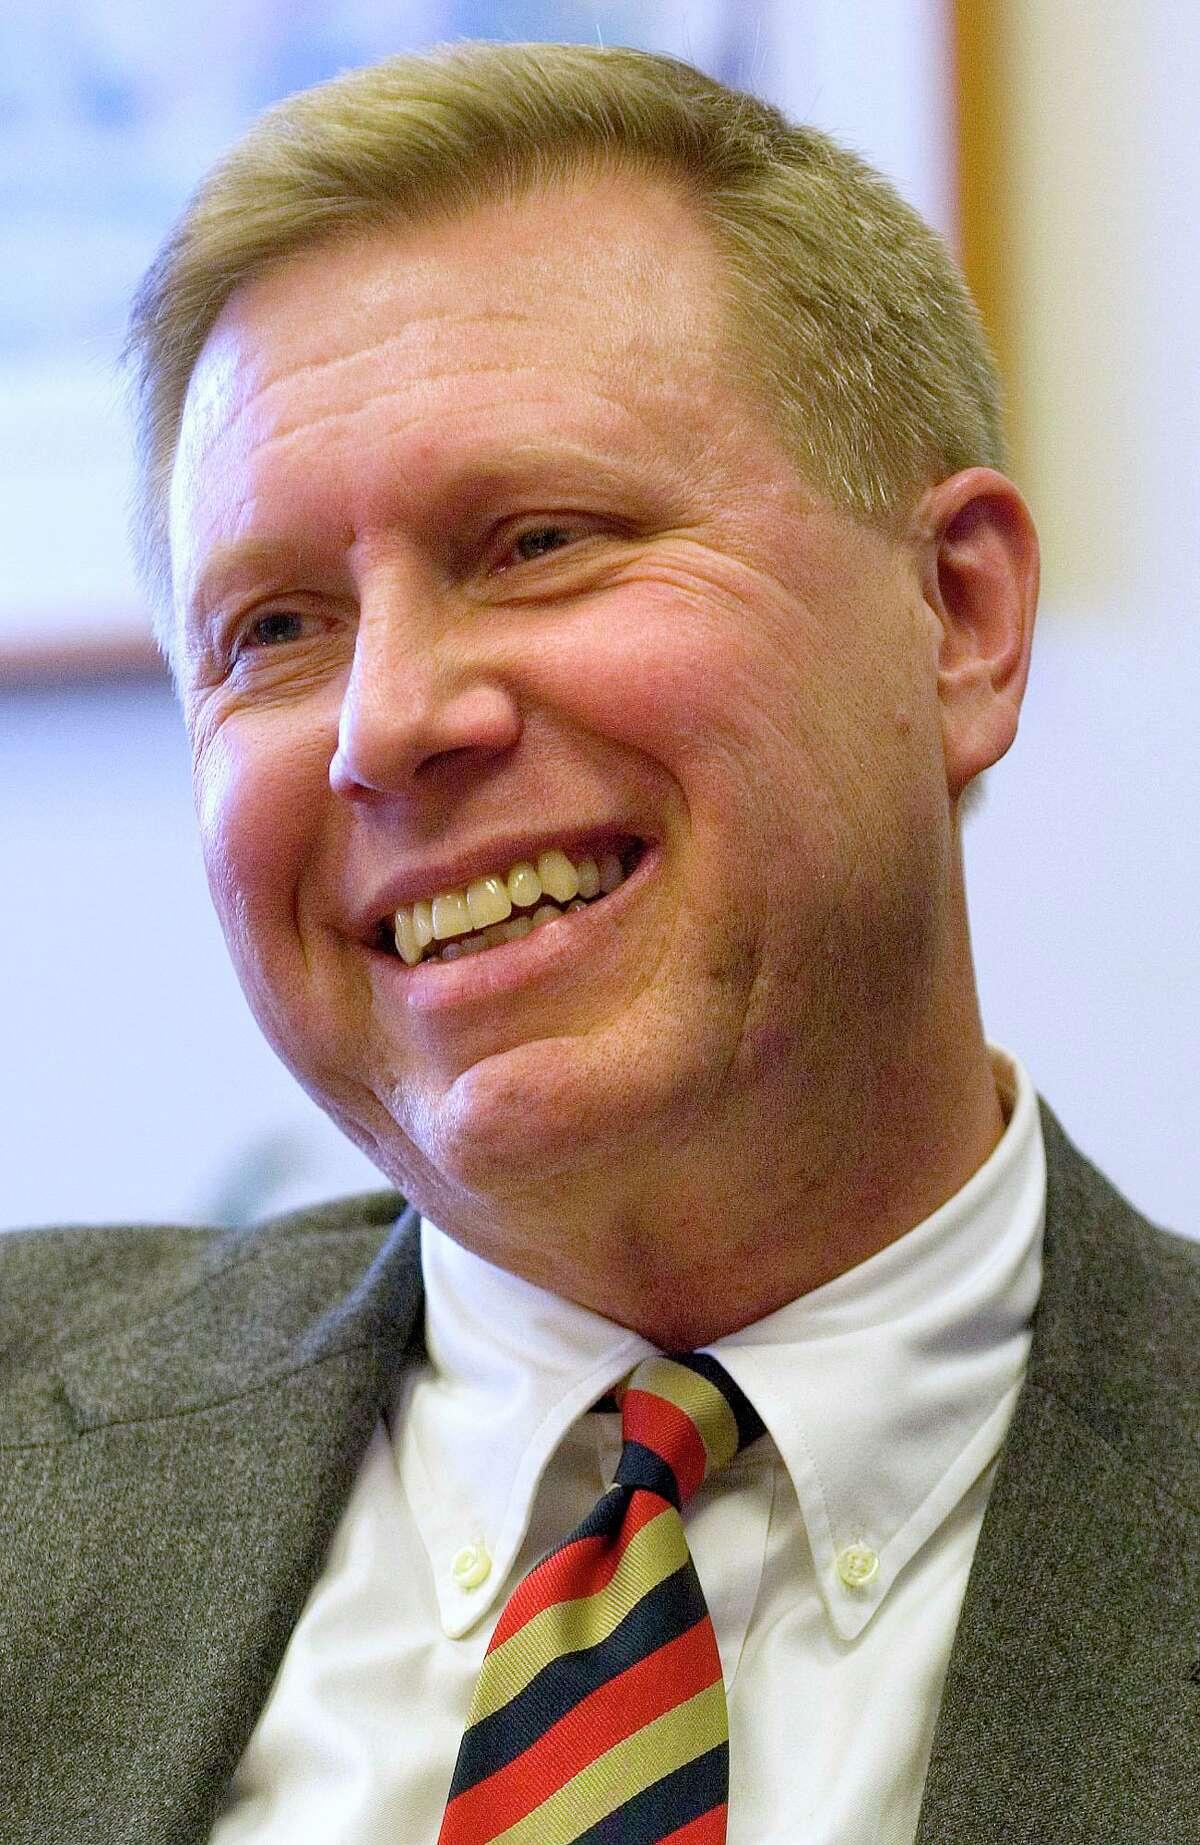 Bruce Tuomala is Danbury's economic development director.